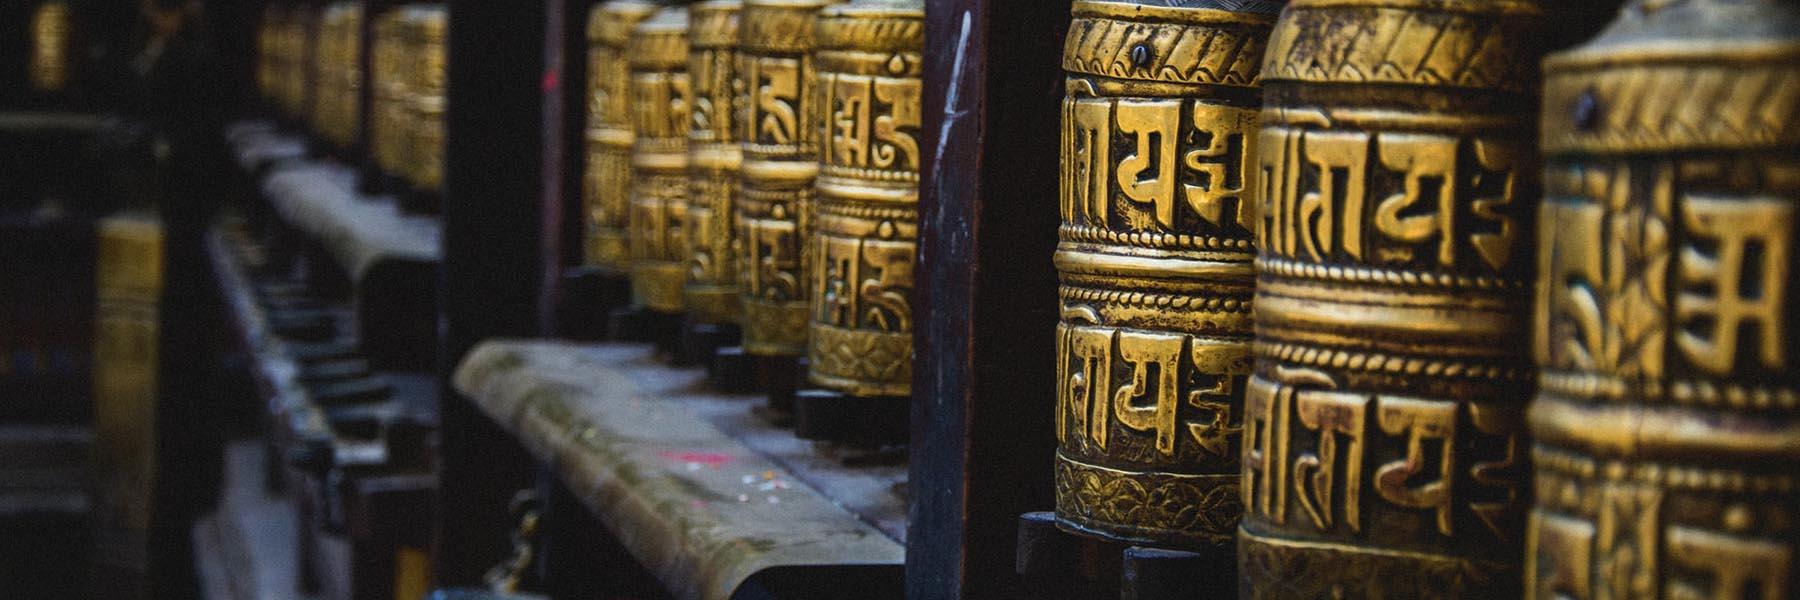 India Buddha Trail